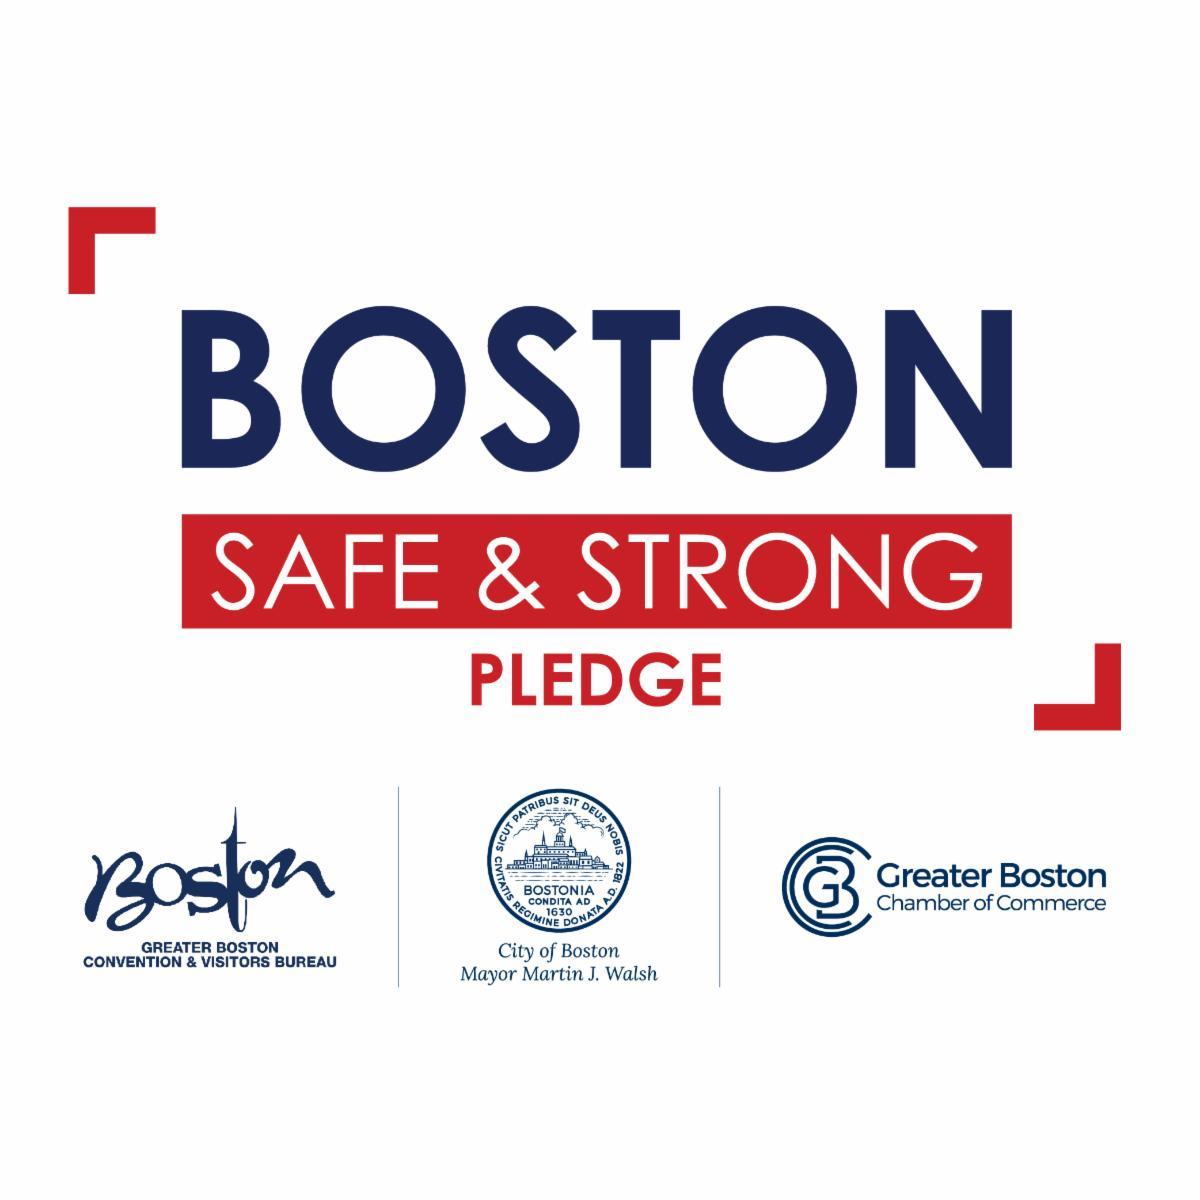 Boston Safe & Strong Pledge